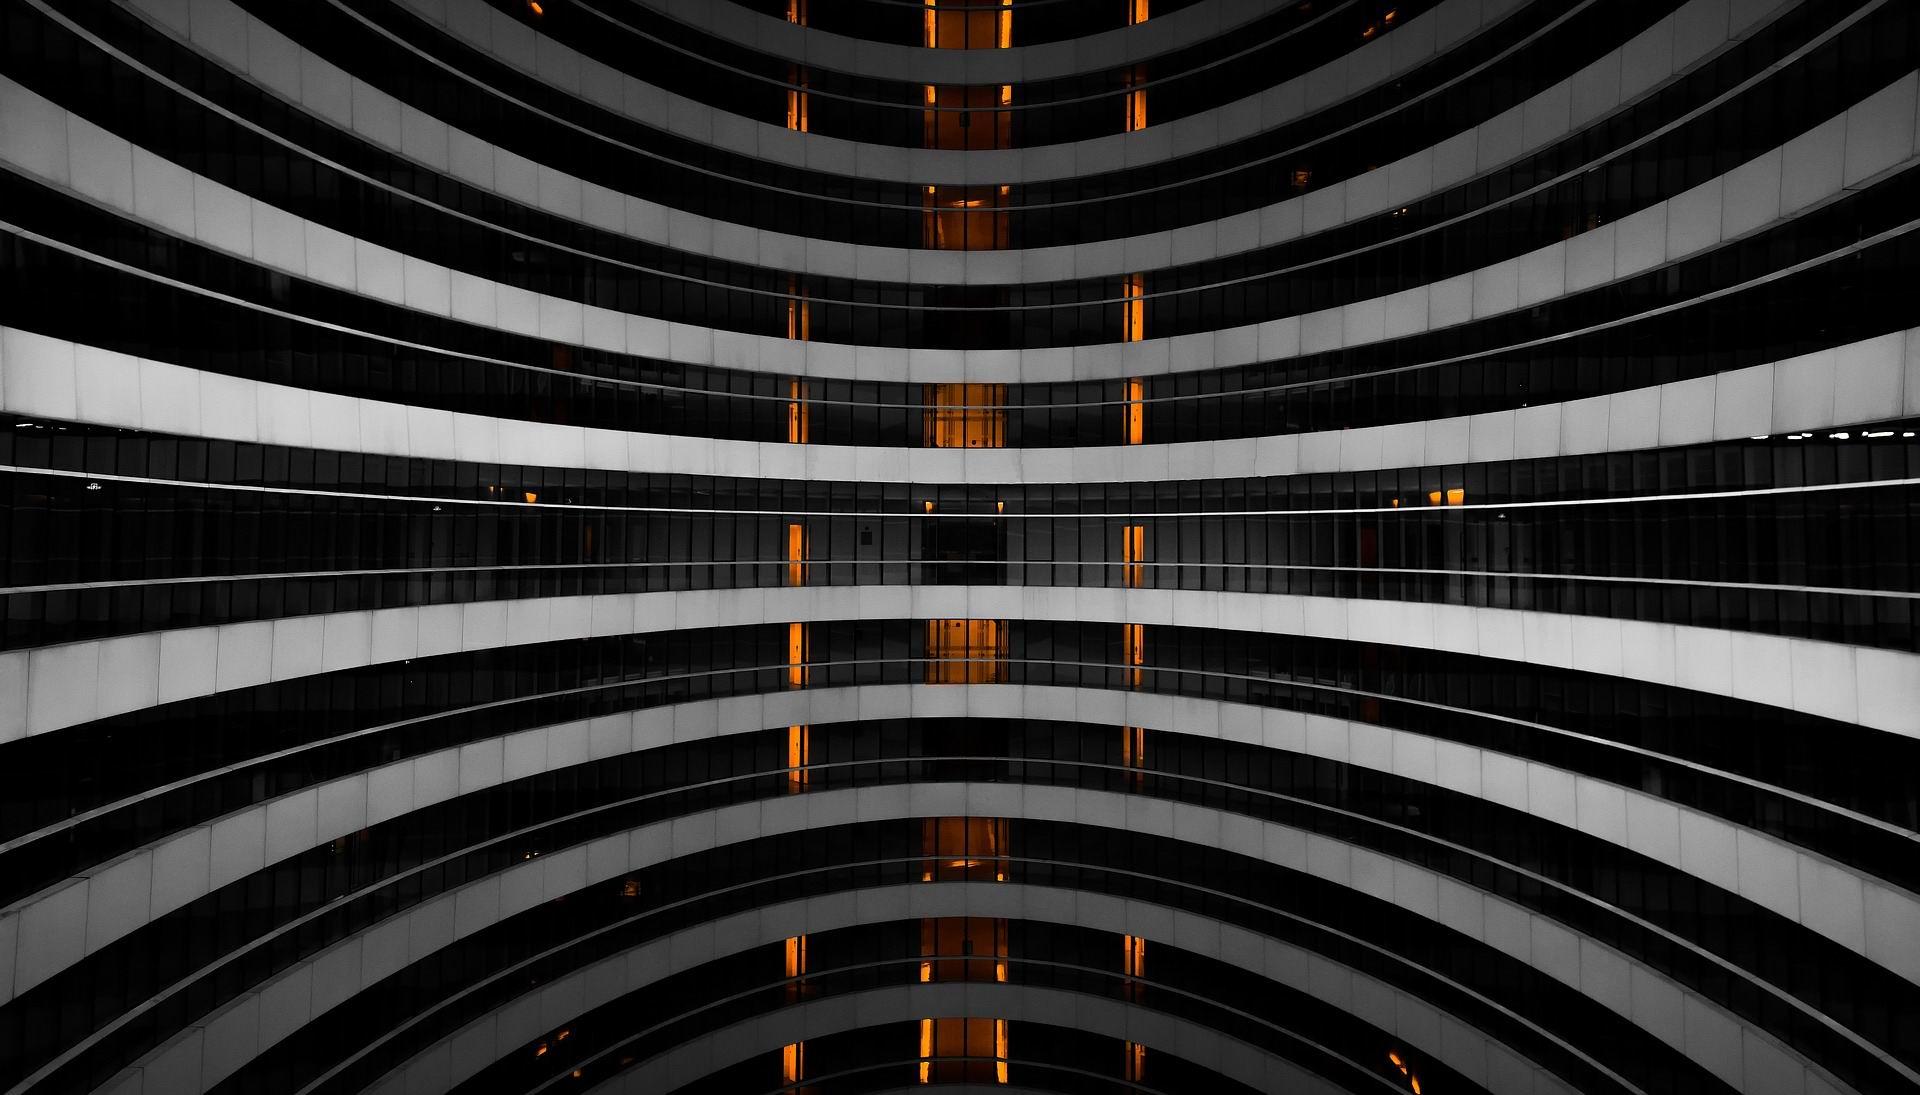 SOHO BUILDING -- AsmuSe -- PX